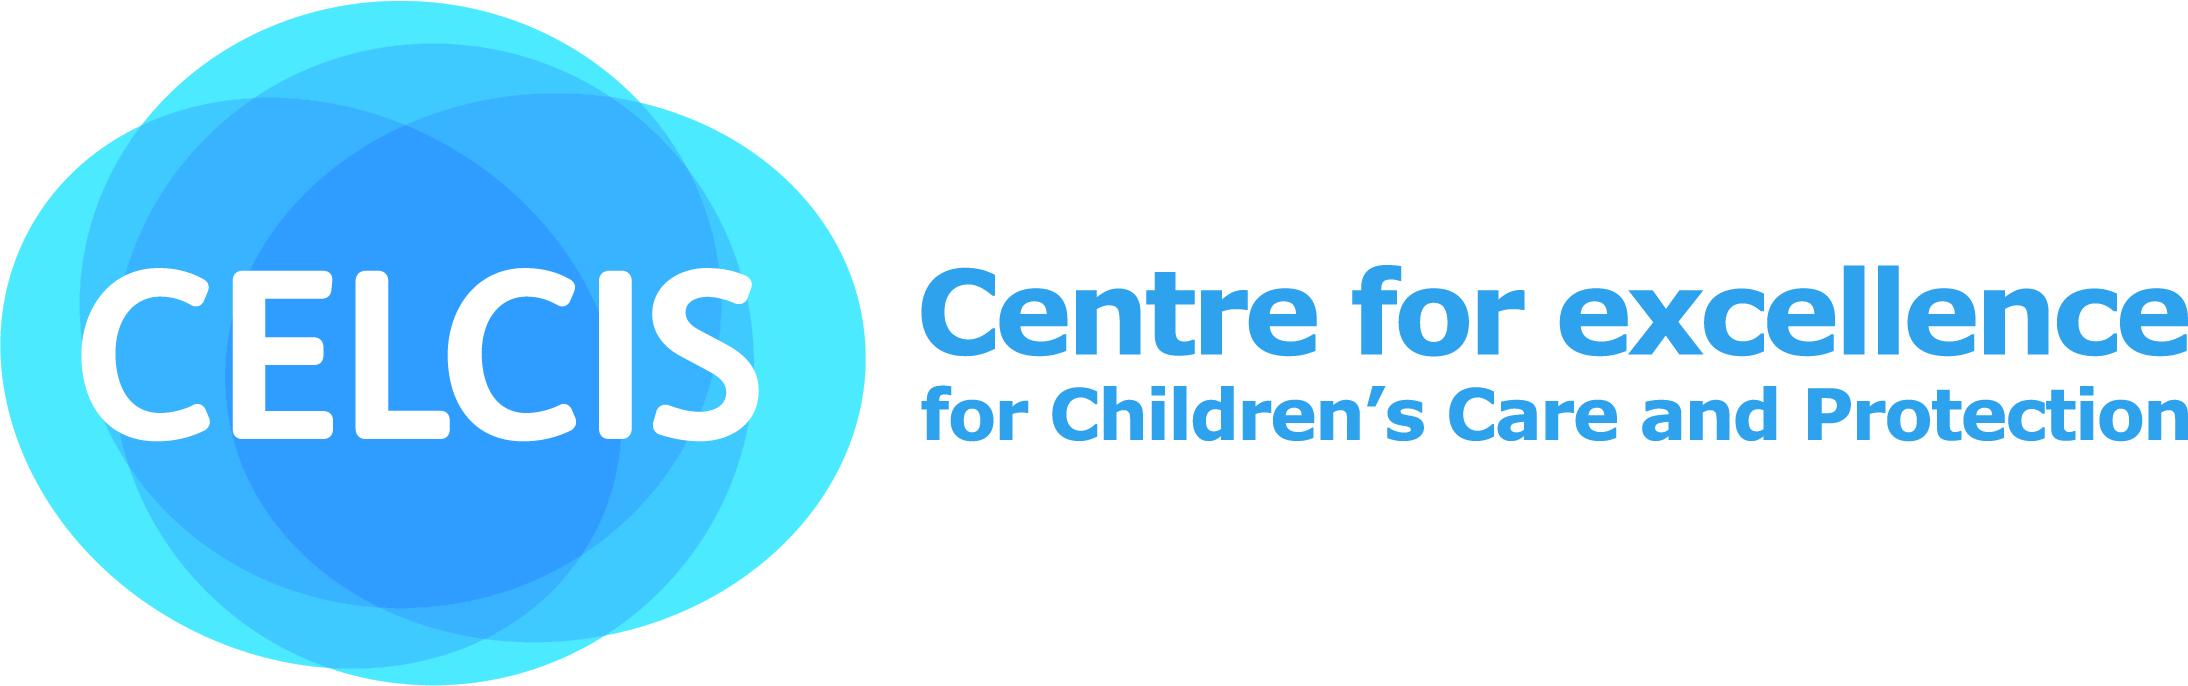 CELCIS logo new (landscape) - cmyk